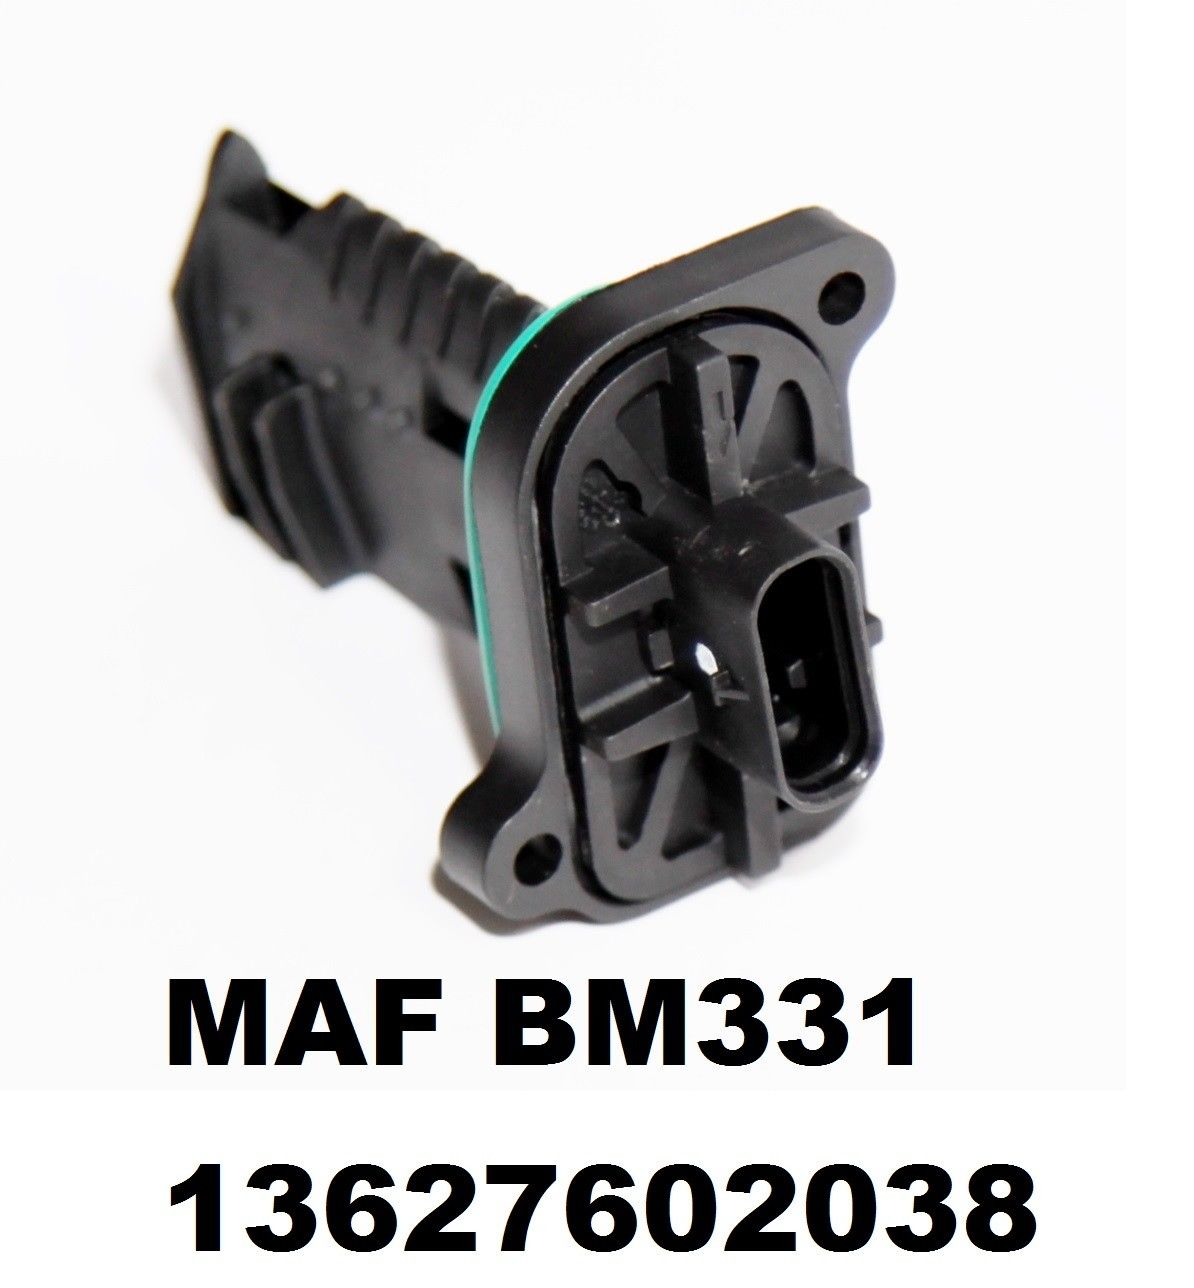 hight resolution of mass air flow sensor for bmw 14 16 228i 428i 13 16 320i 328i xdrive x1 x3 walmart com